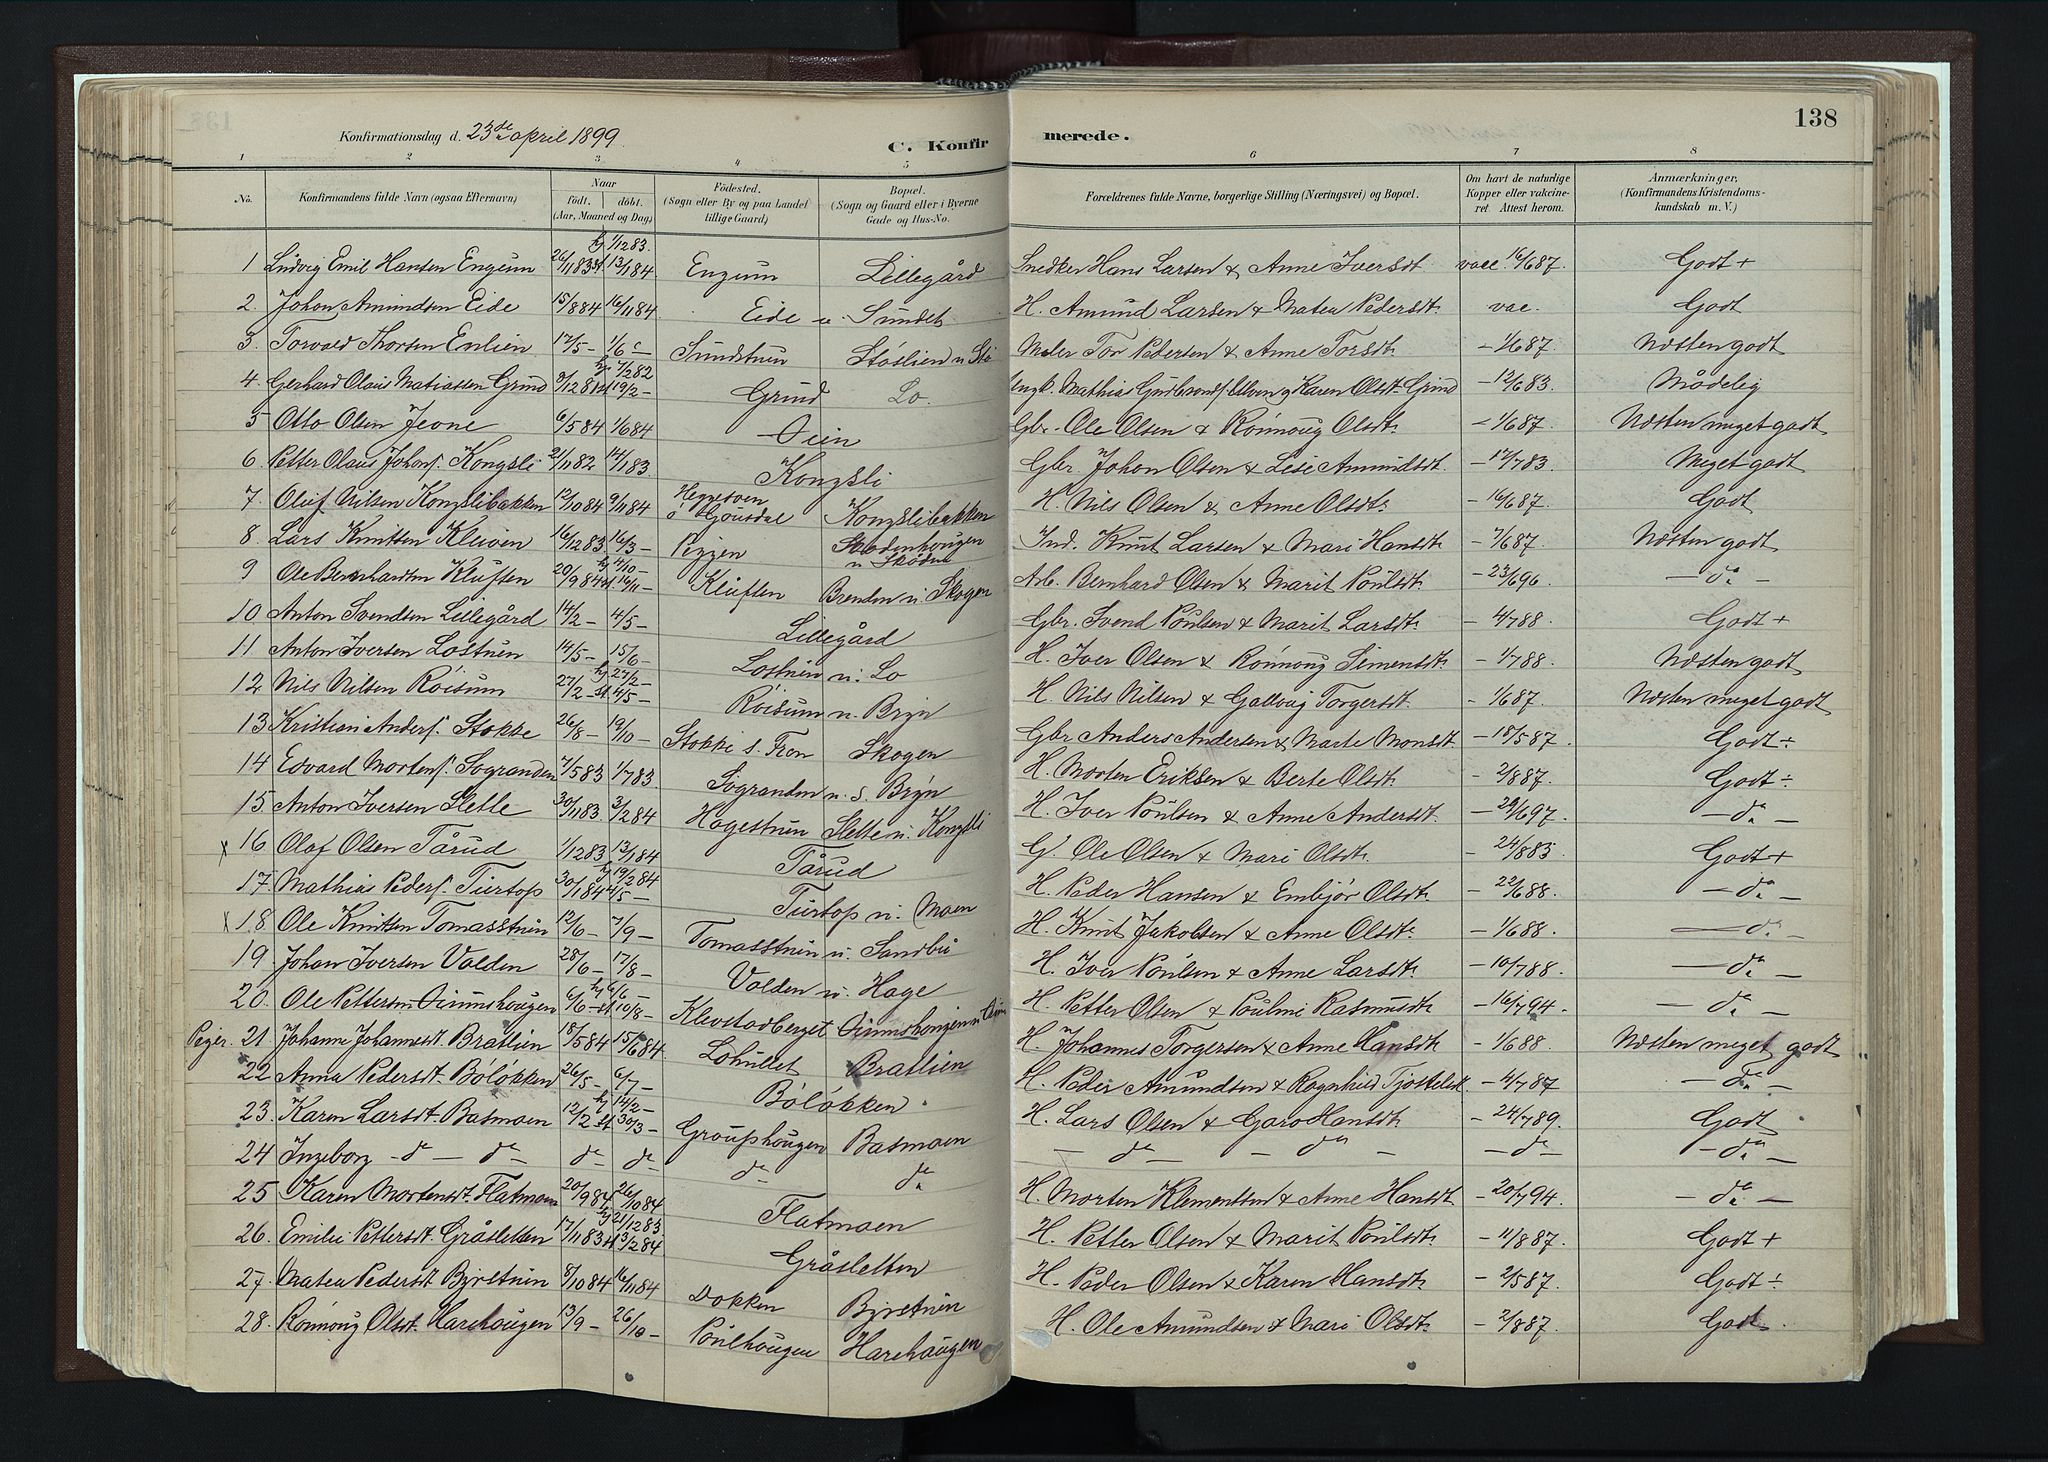 SAH, Nord-Fron prestekontor, Ministerialbok nr. 4, 1884-1914, s. 138